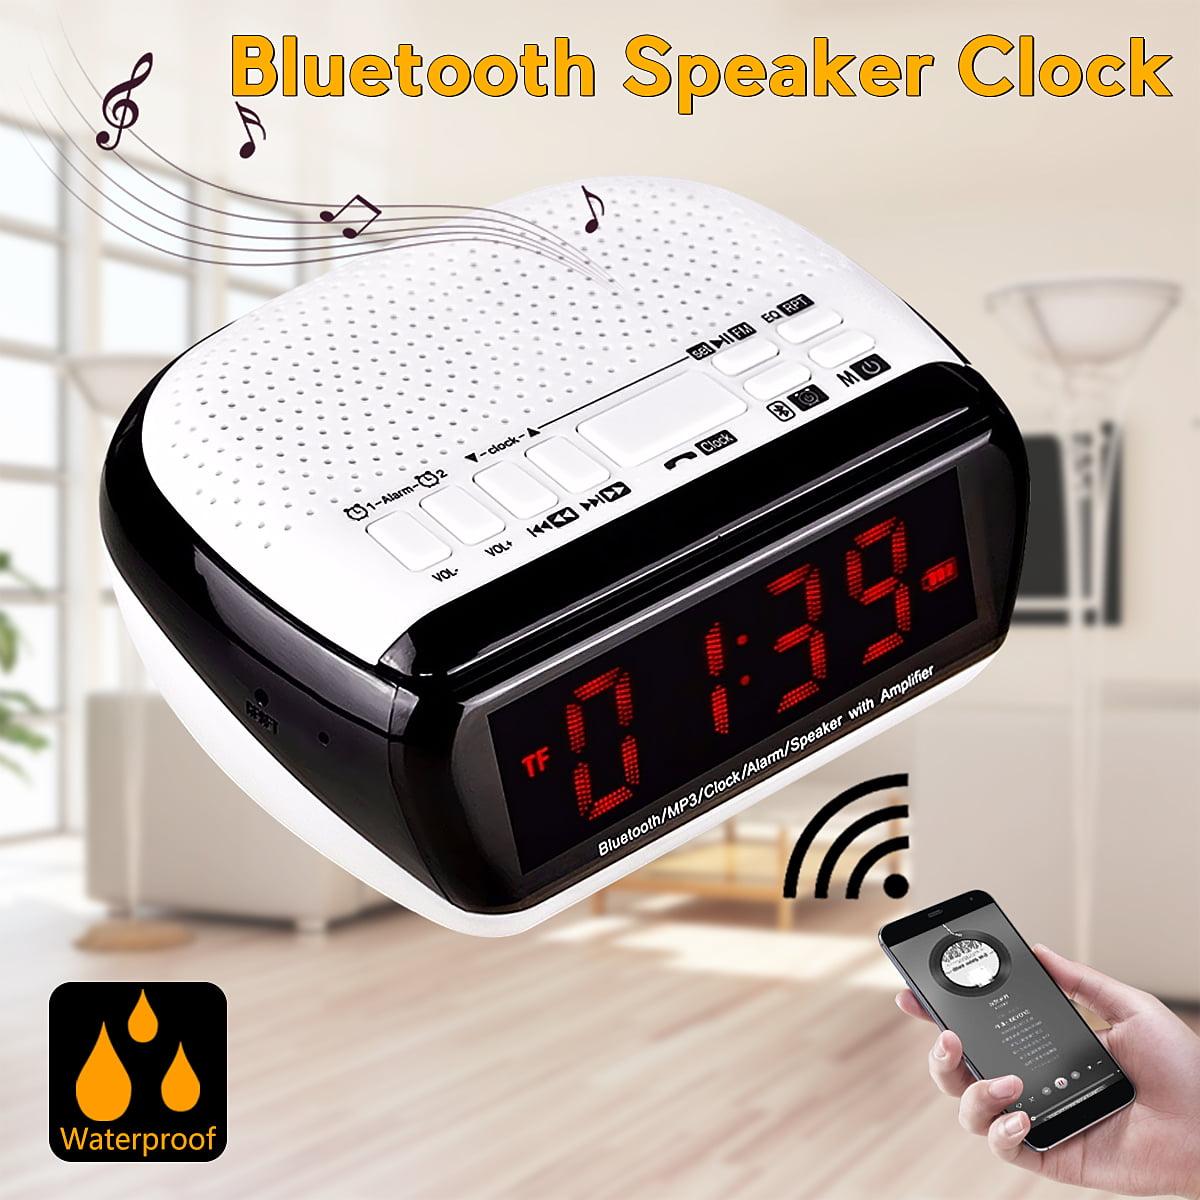 acd1ecb7bdb Bluetooth Digital Alarm Clock Stereo Speaker LED Display FM Radio MP3  Player USA - Walmart.com